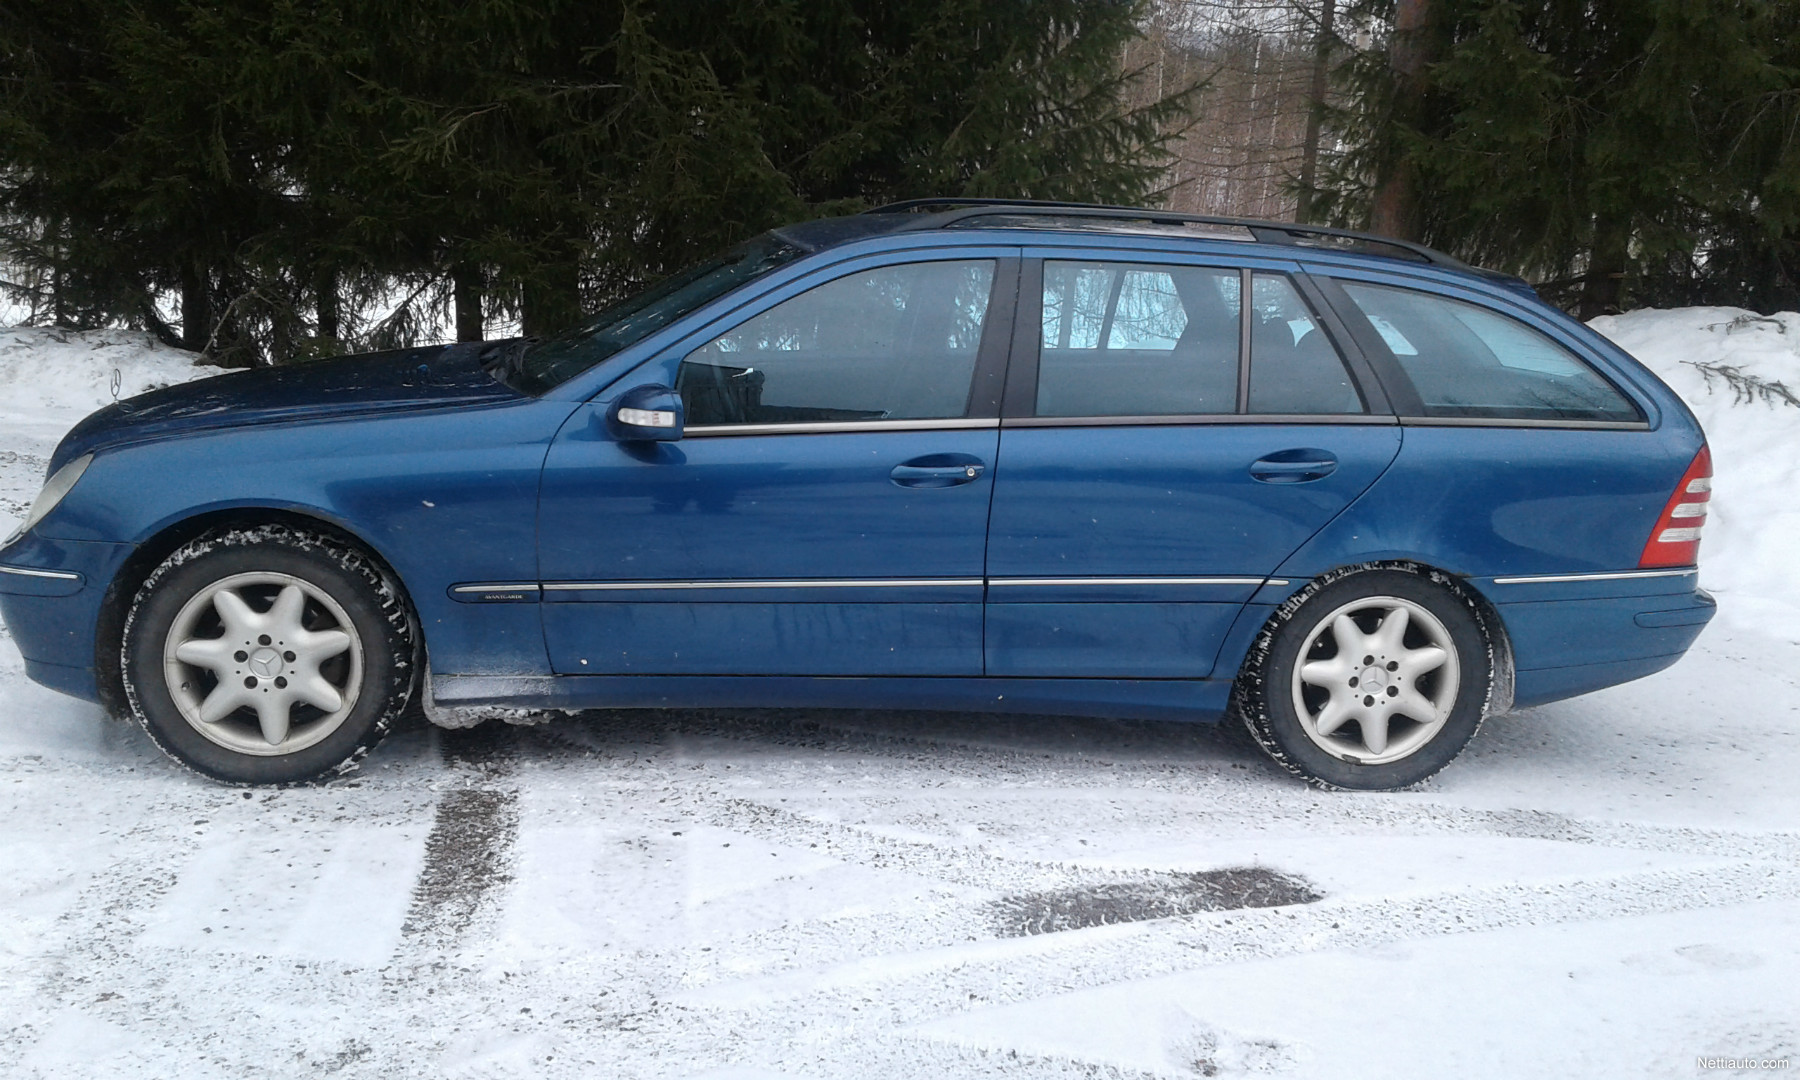 Mercedes benz c 220 cdi avantgarde 4d station wagon 2002 for Mercedes benz station wagon